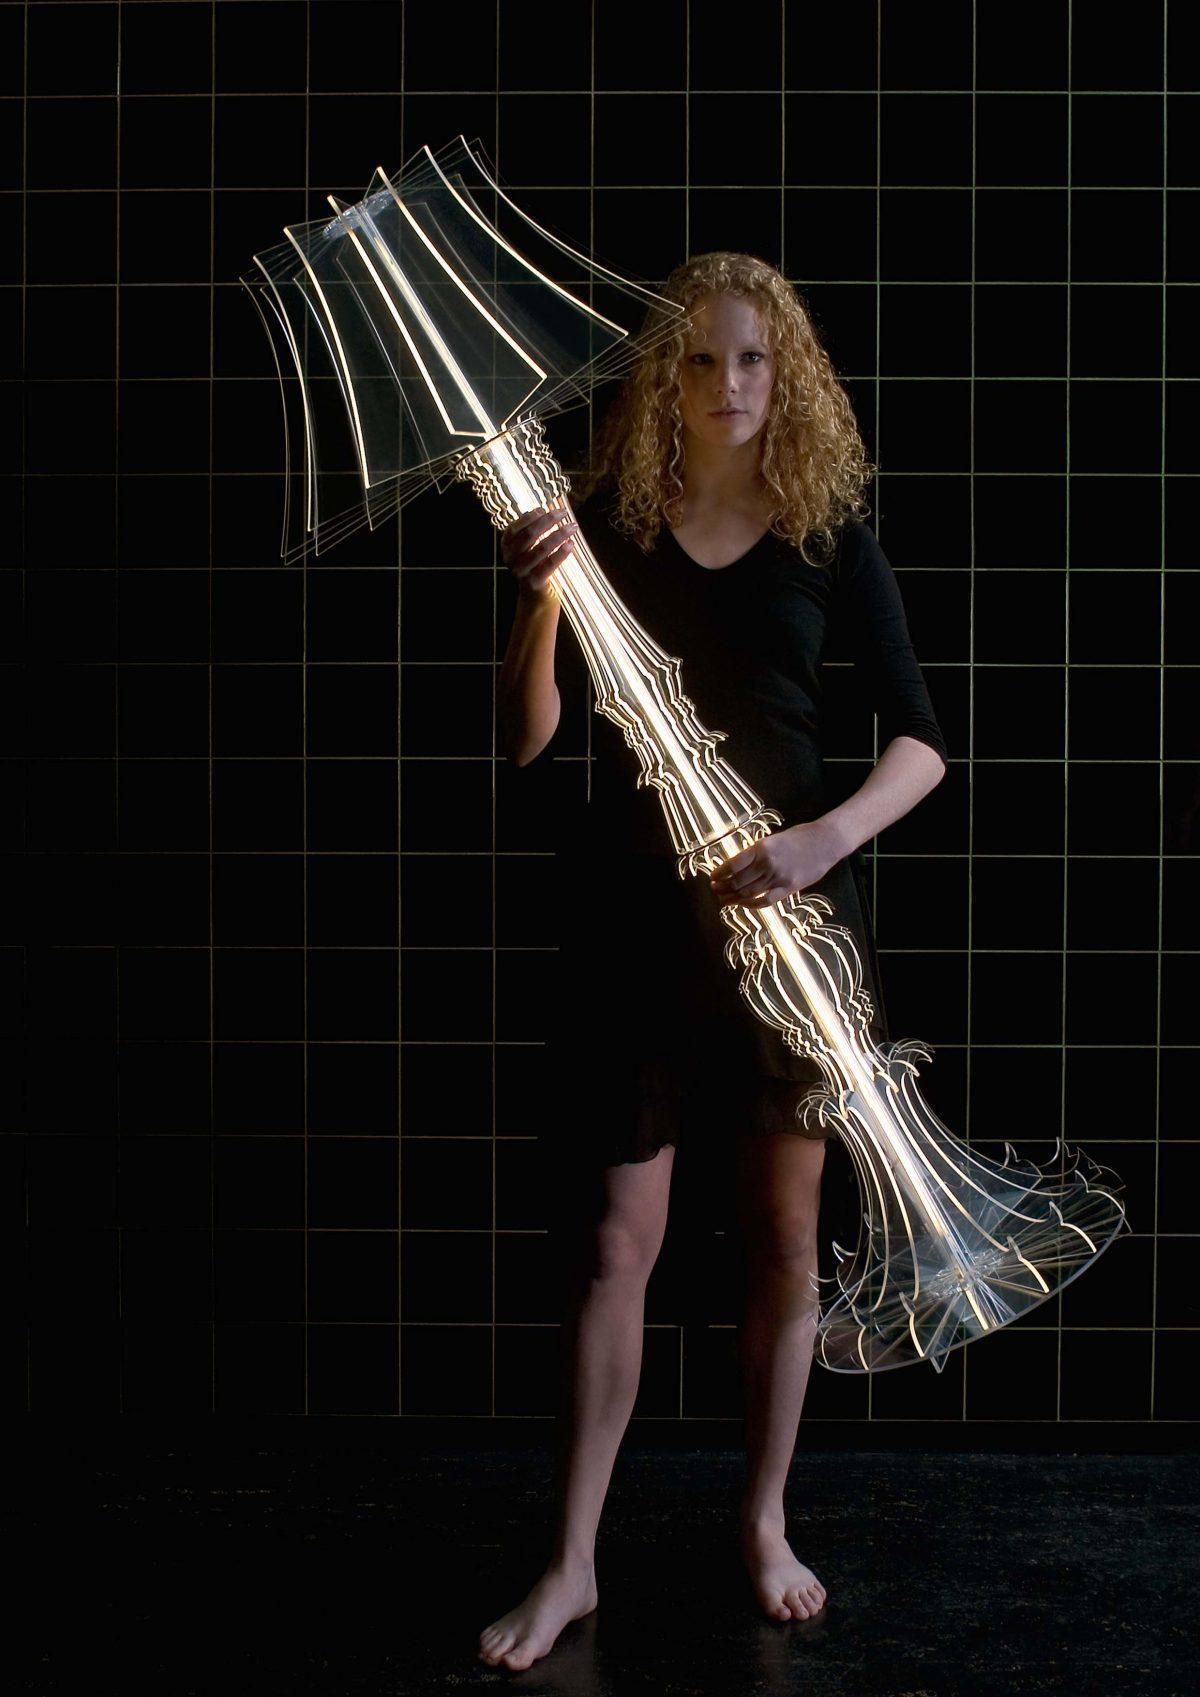 Josephine vloerlamp Studio Sander Mulder model